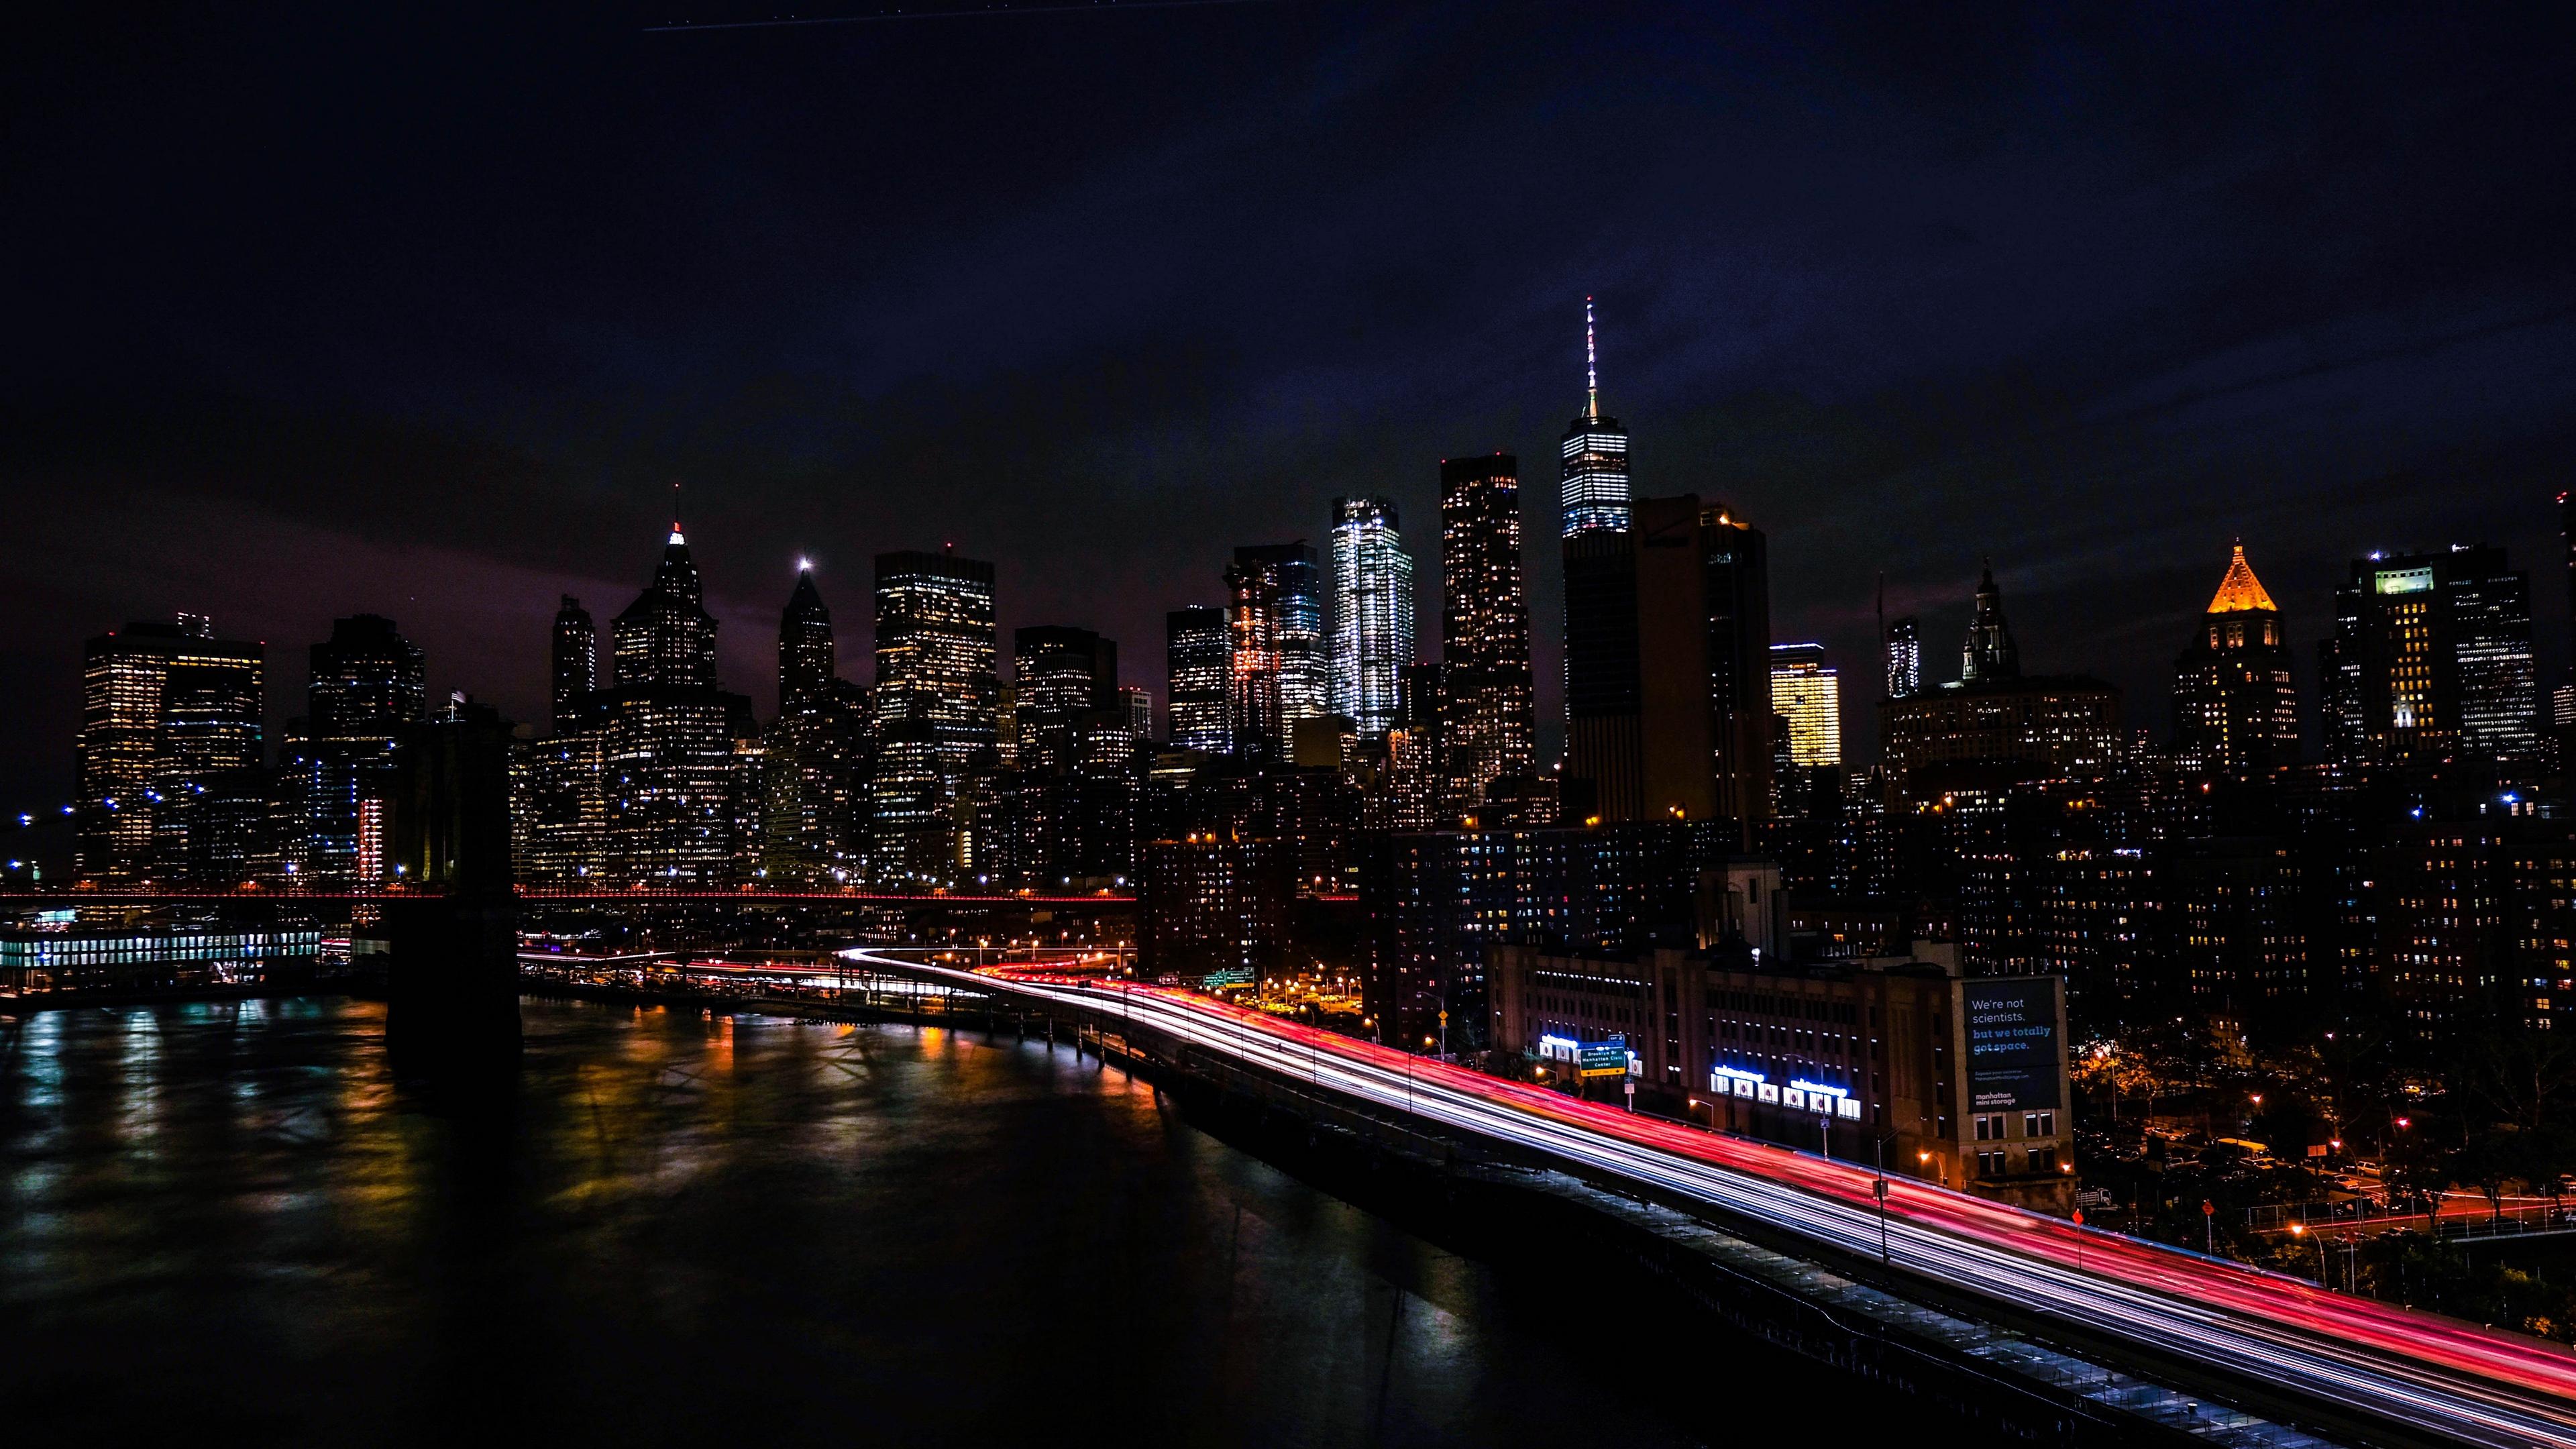 new york usa night city shore skyscrapers 4k 1538068110 - new york, usa, night city, shore, skyscrapers 4k - USA, night city, new york